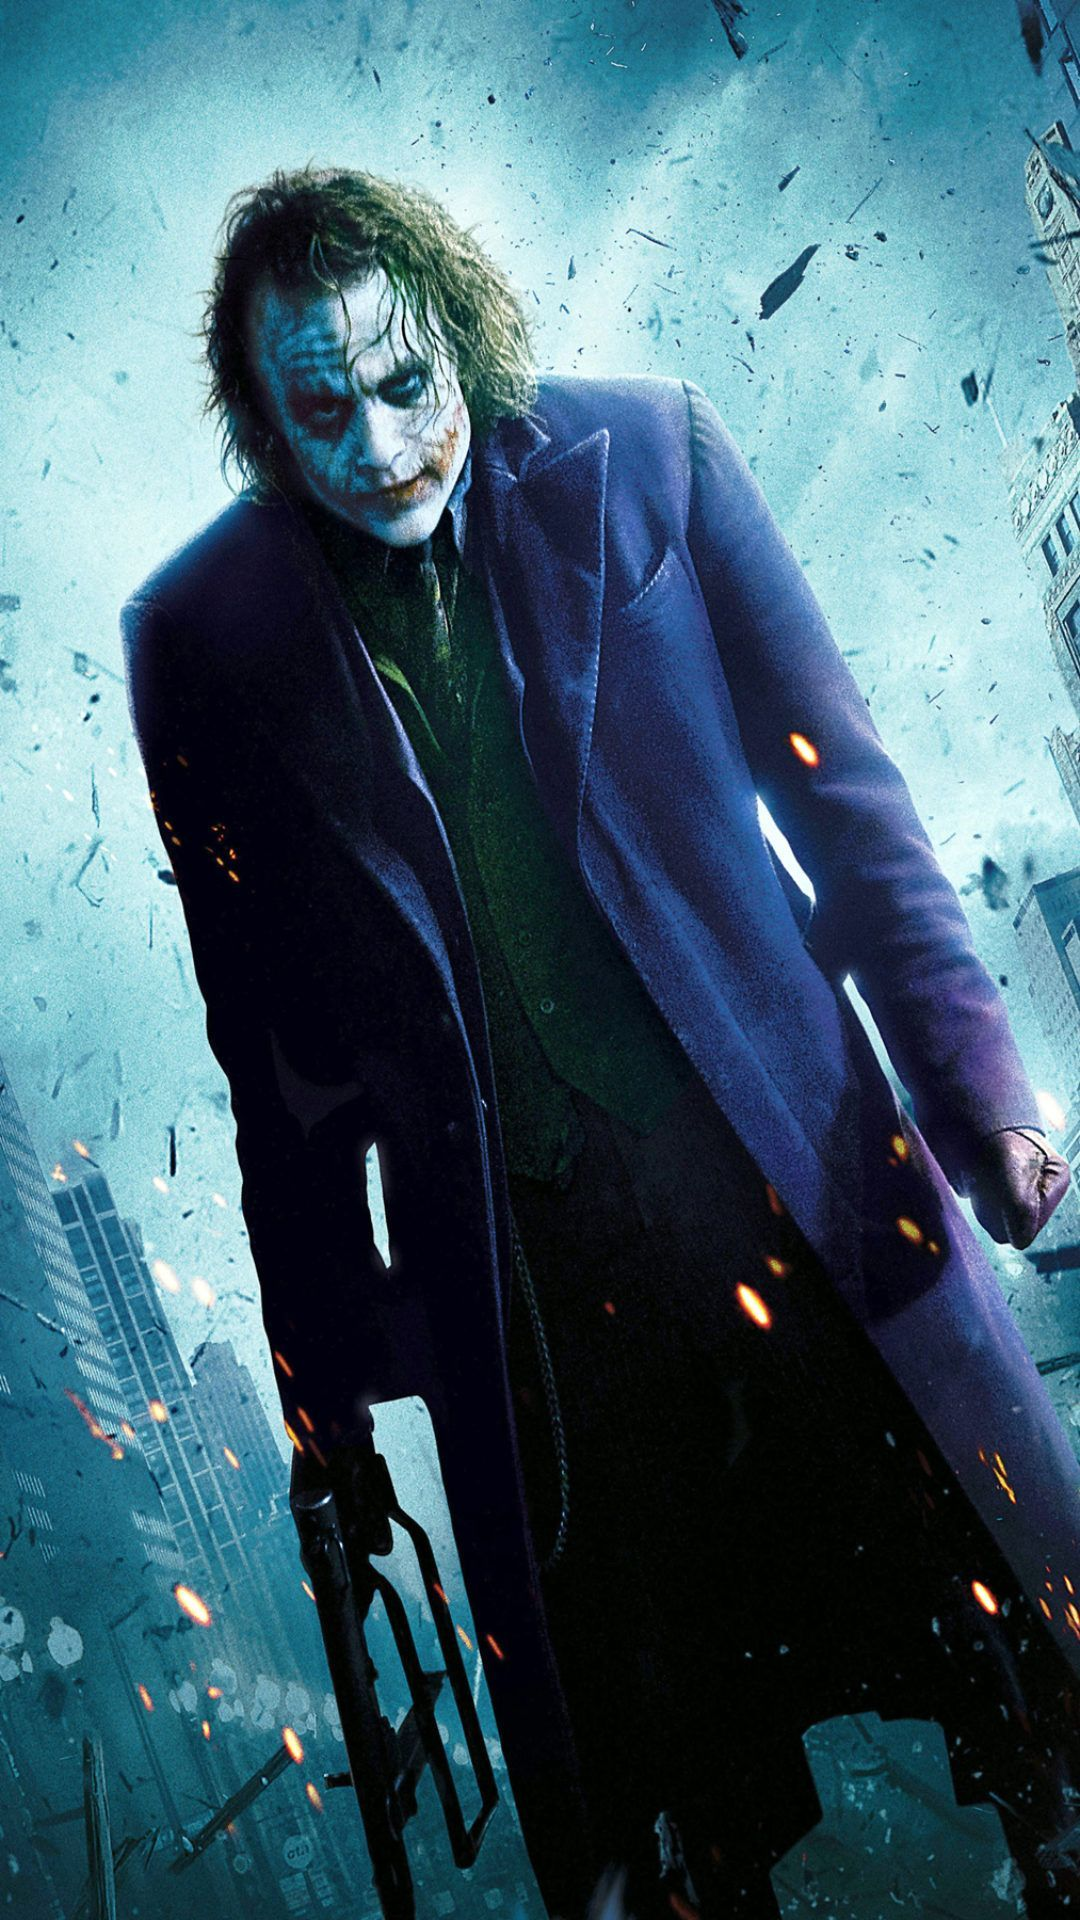 Joker Hd Wallpapers For Iphone 6 32 Image Collections Of Wallpapers Joker Hd Wallpaper Joker Wallpapers Joker Images